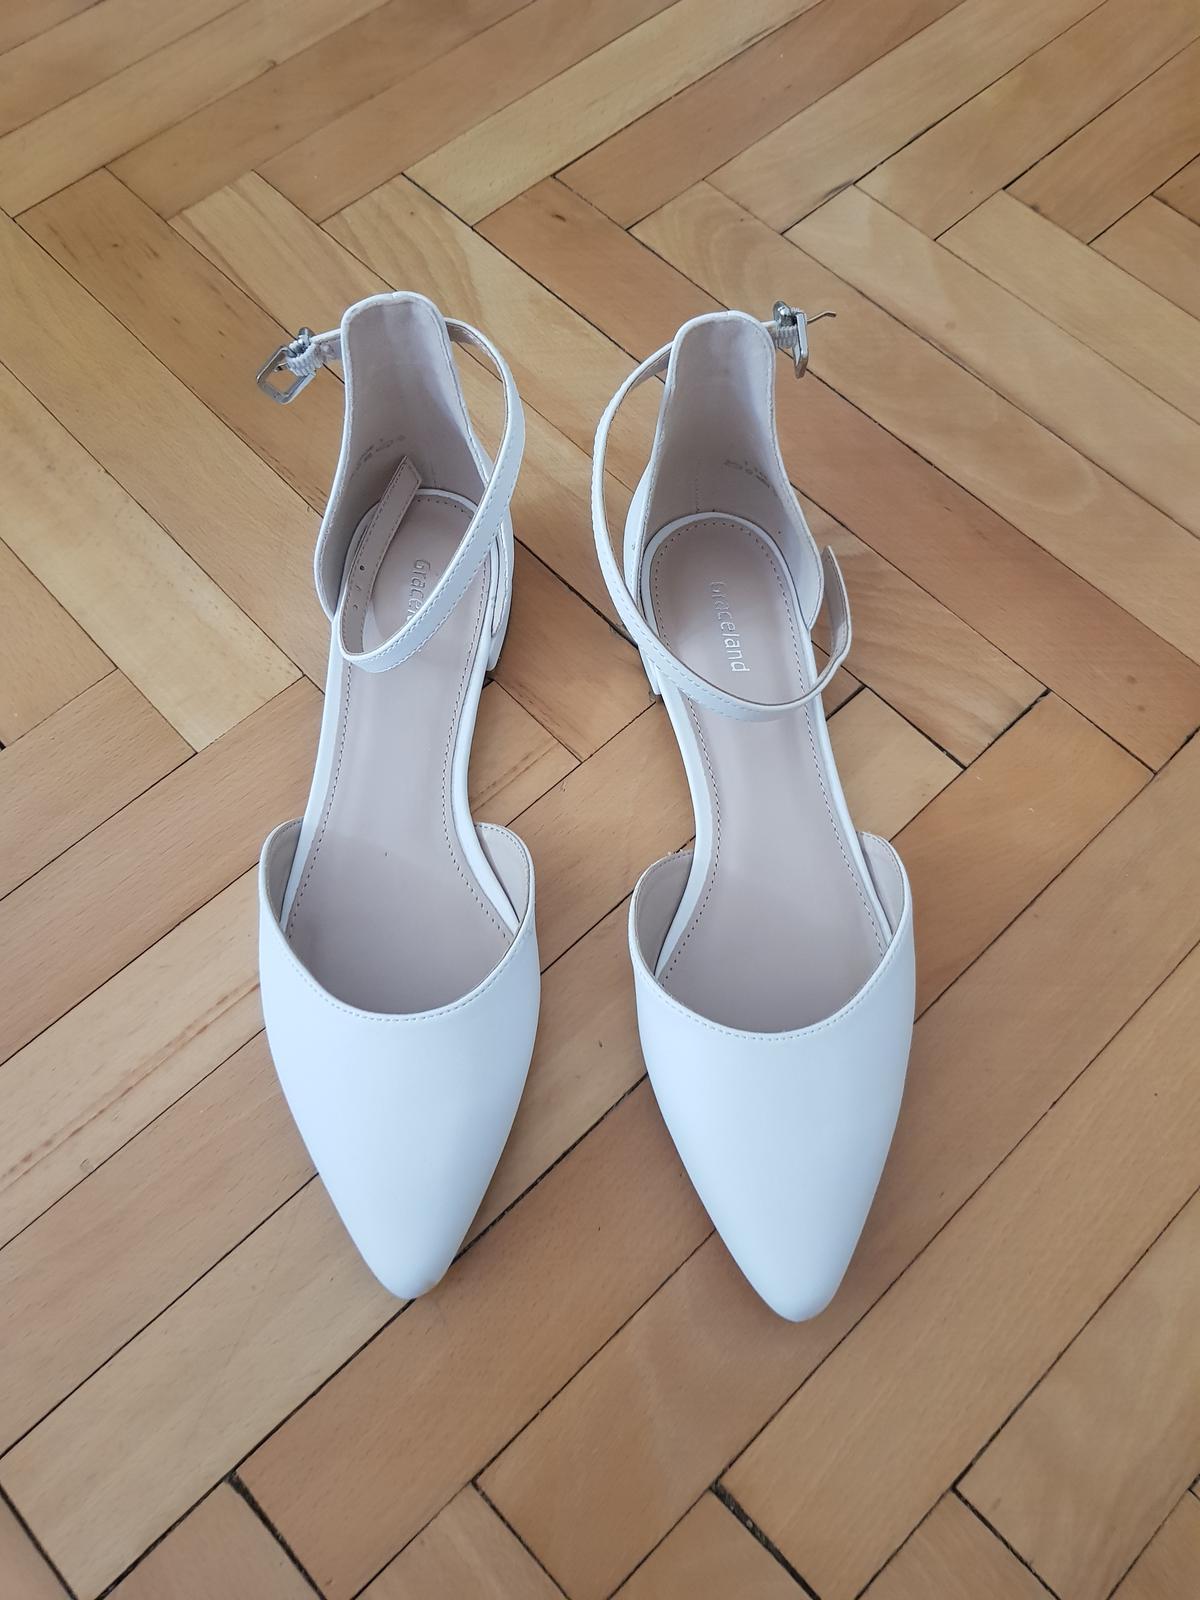 Biele baleríny - Obrázok č. 2